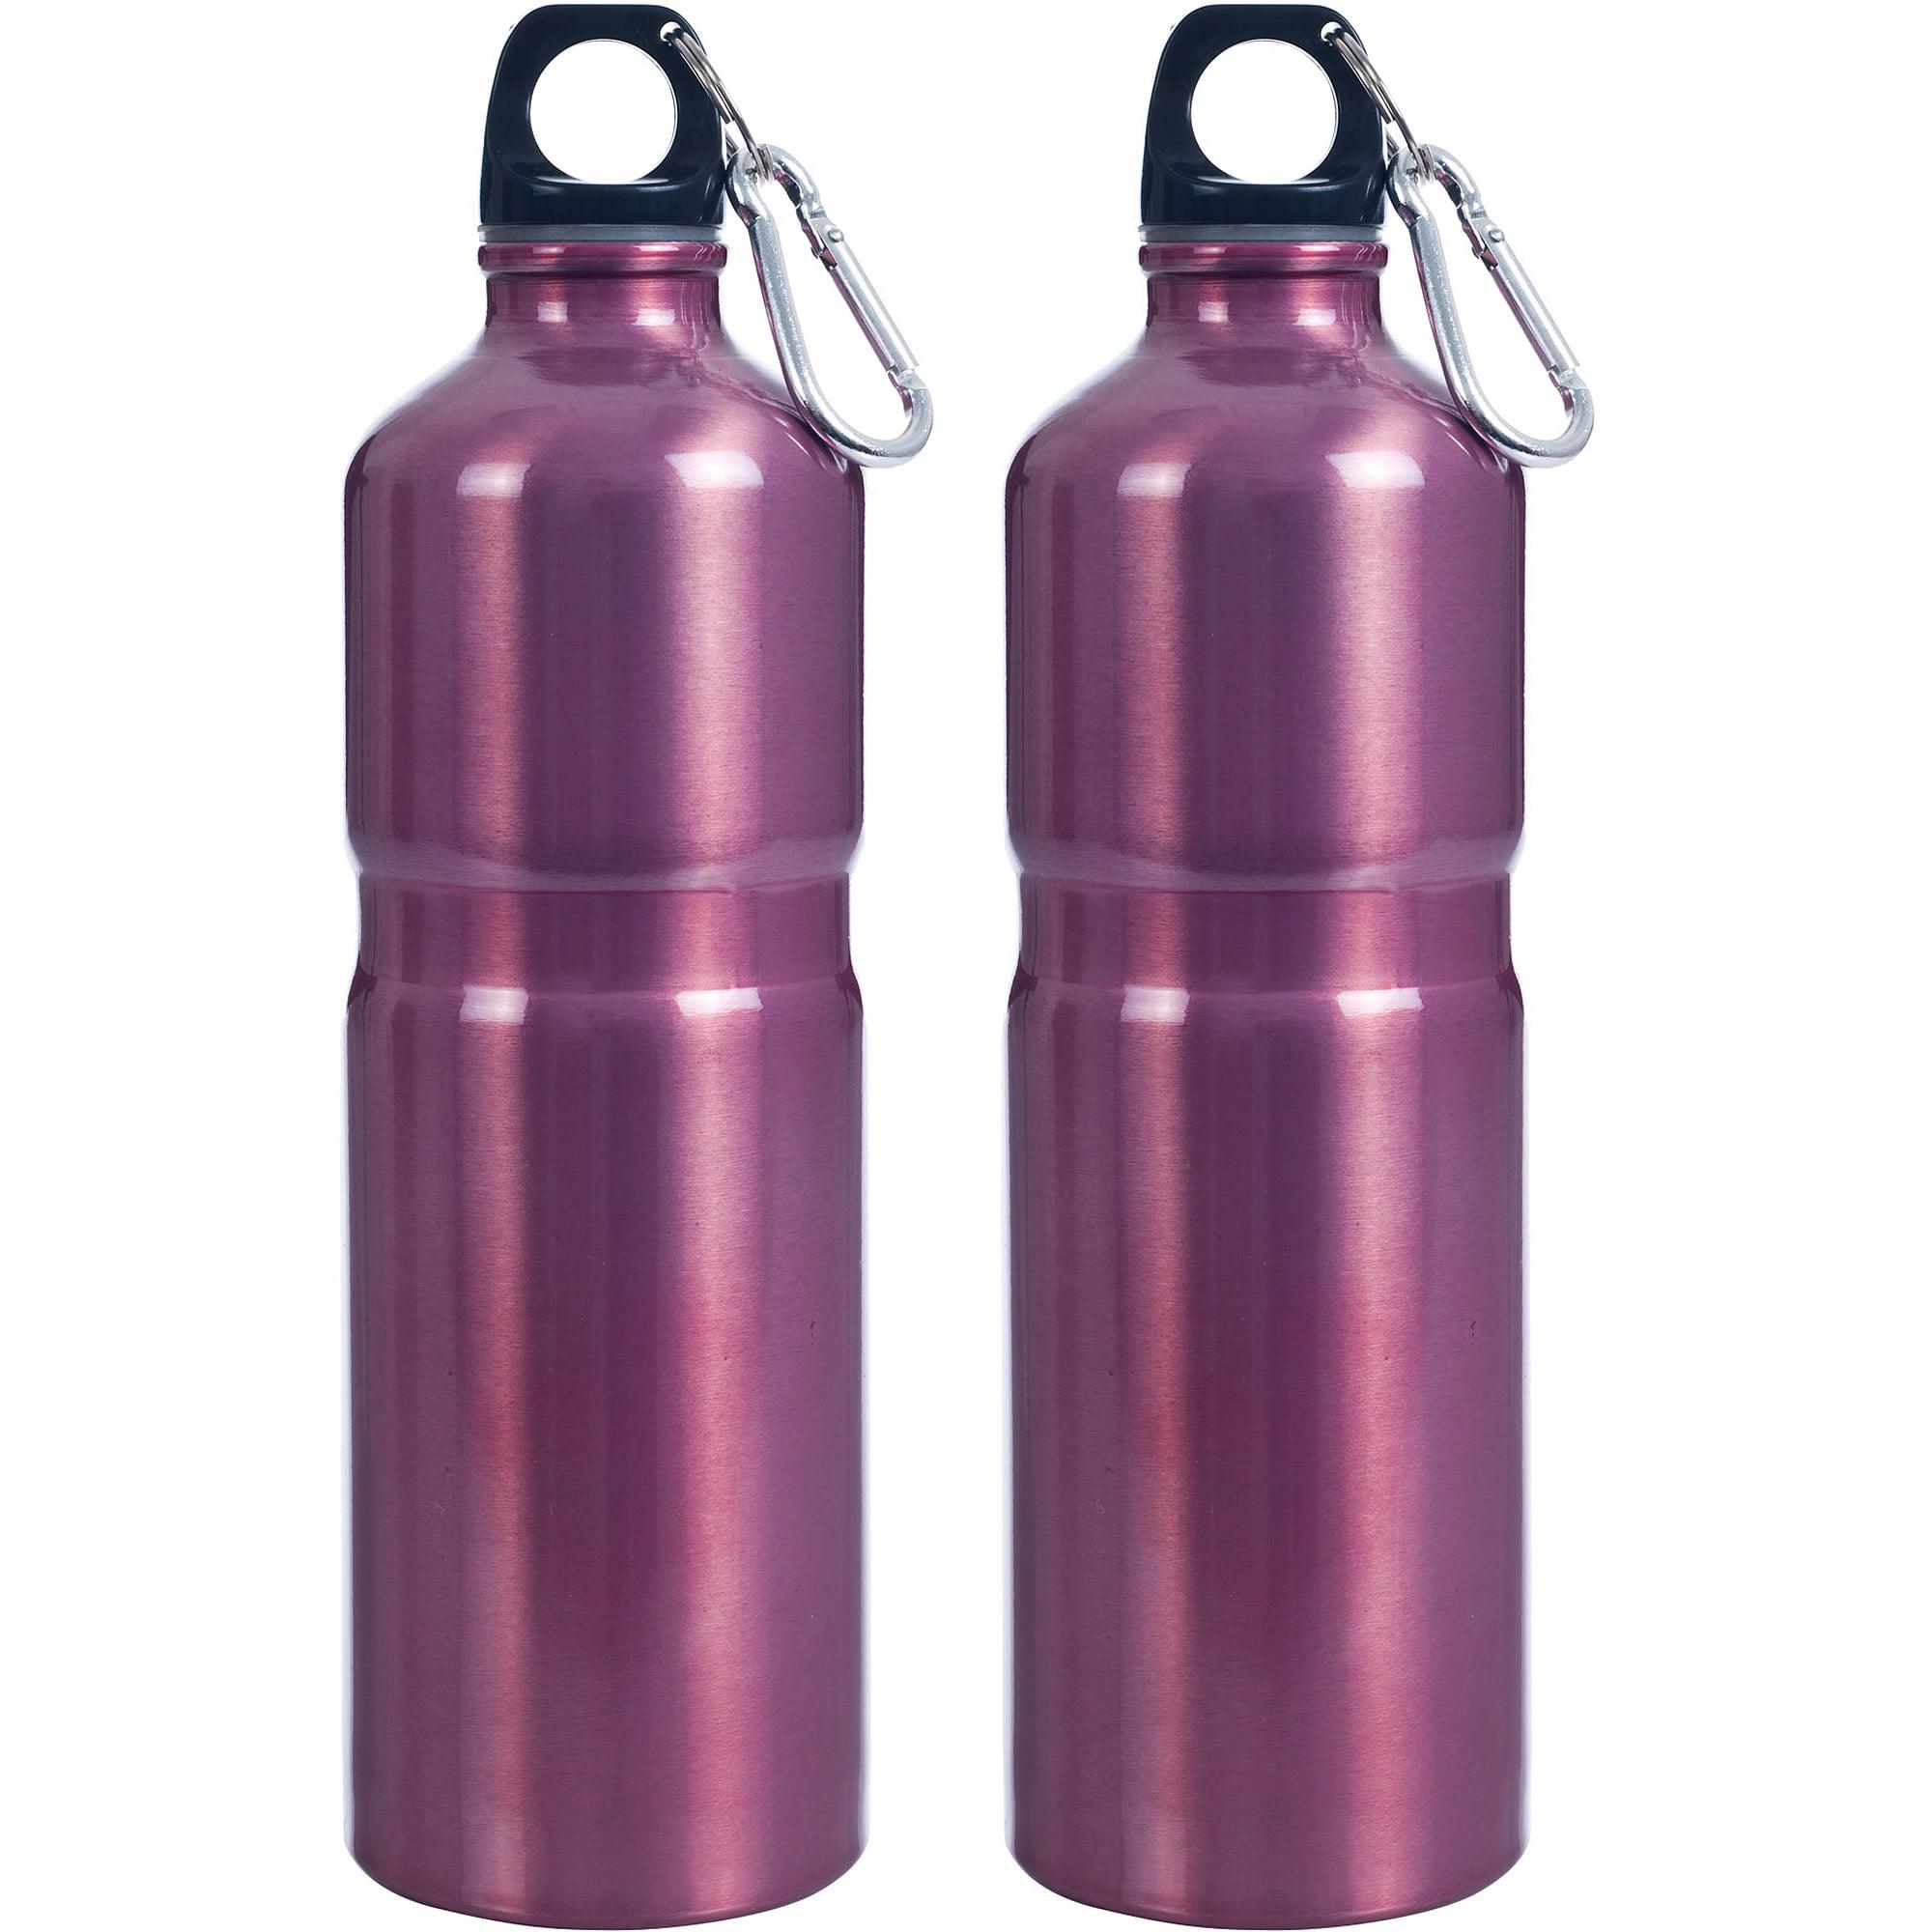 Whetstone Stainless Steel Water Bottle, 2pk, 25oz